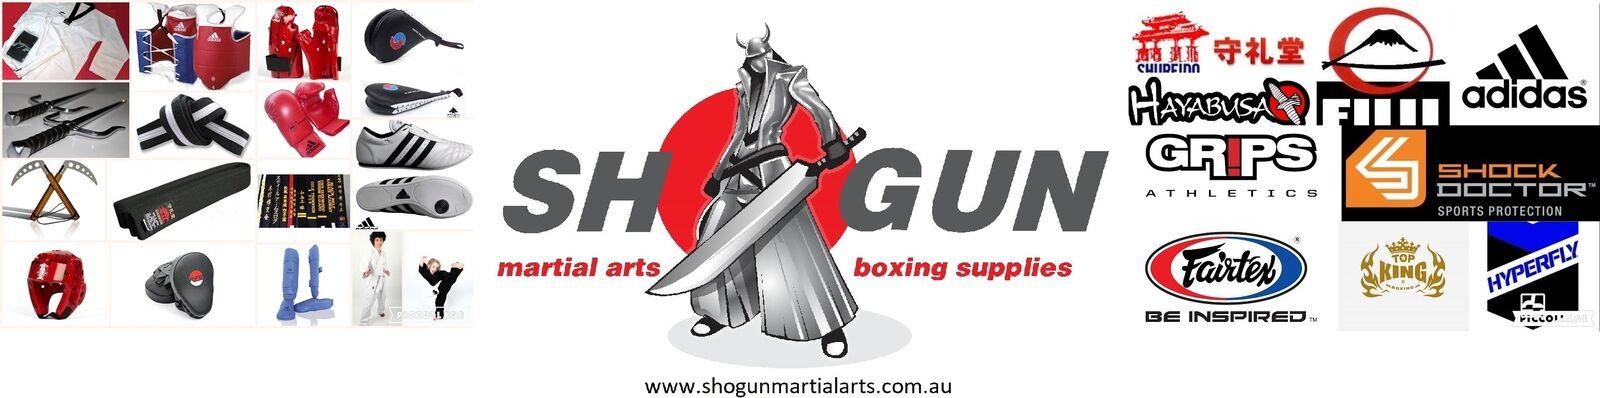 Shogun Martial Arts & Boxing Supply